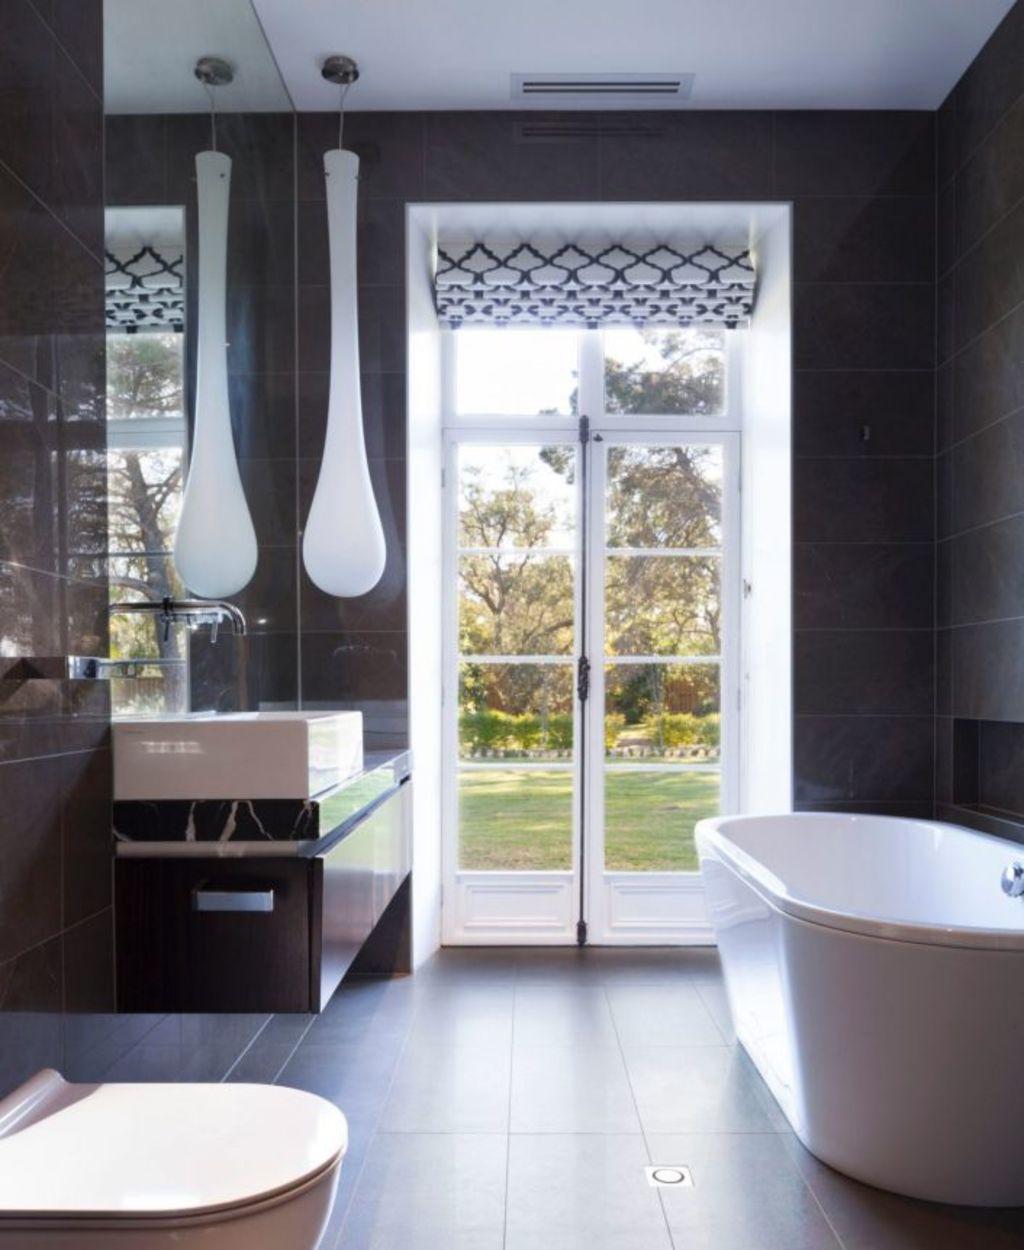 Inverleigh House by McSteen Tan Architects. Photo: Yvonne Qumi